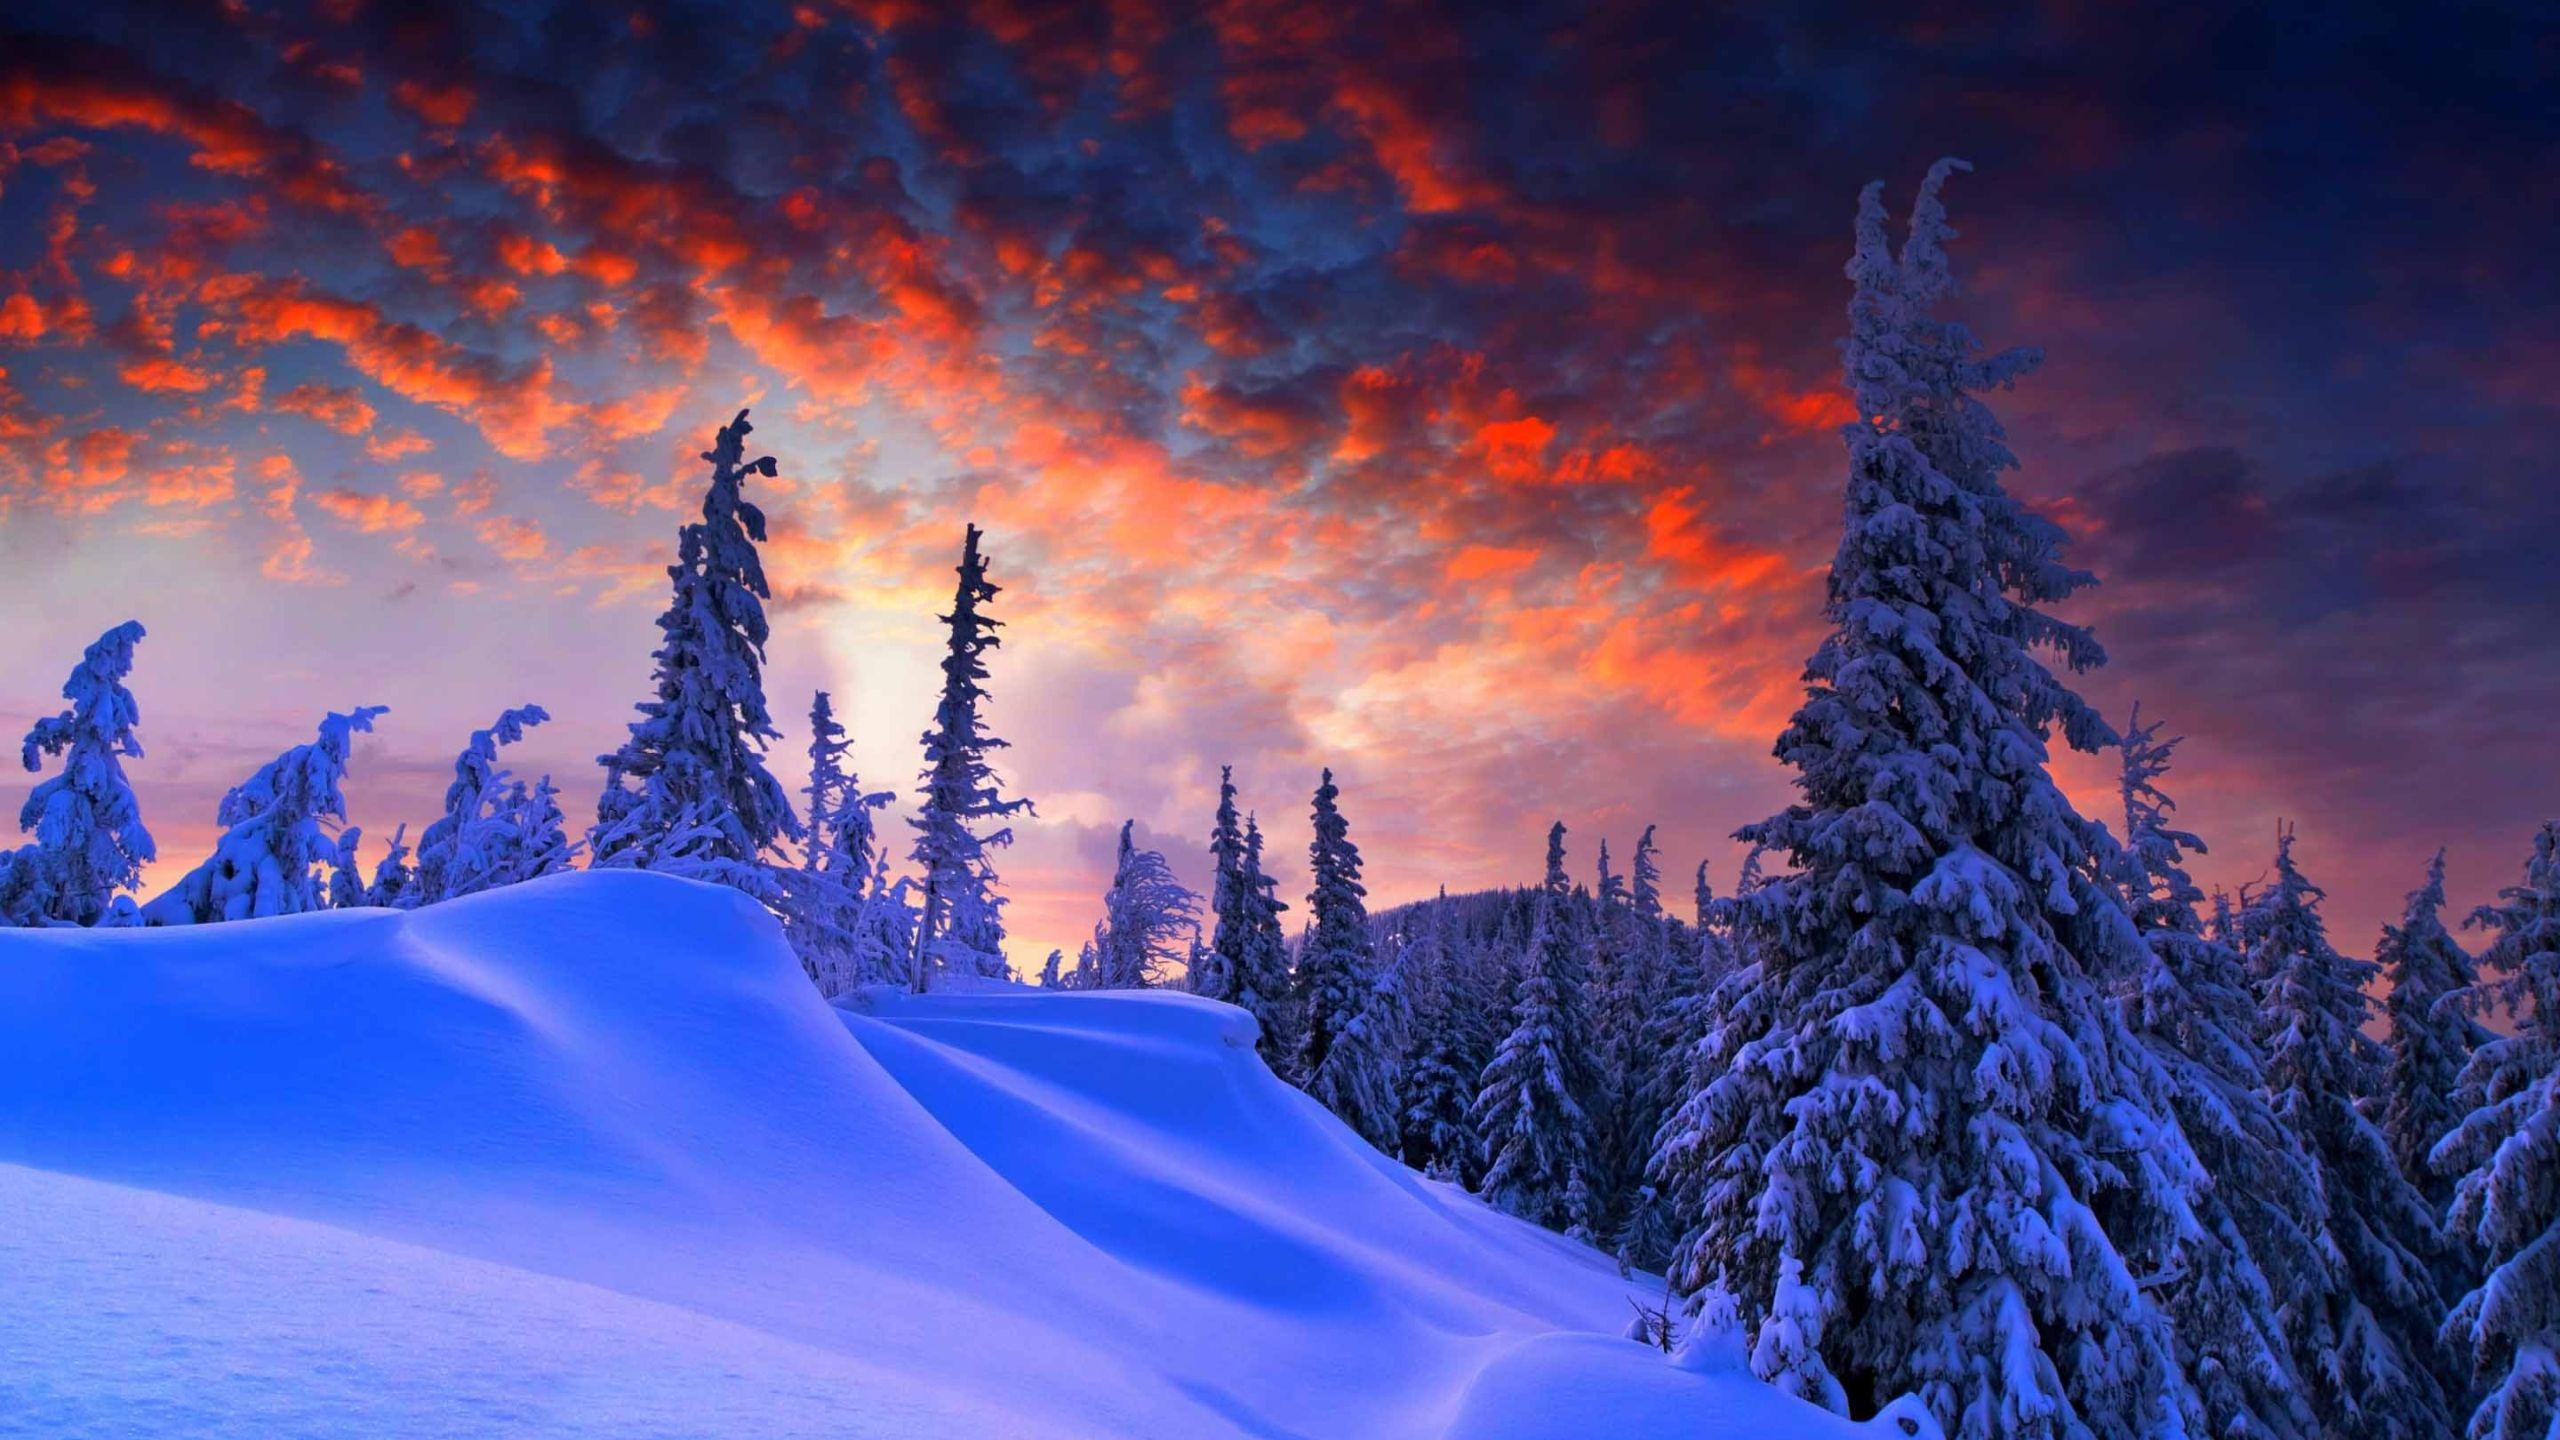 Wallpaper download mac - Christmas Bells Mac Wallpaper Download Free Mac Wallpapers Download